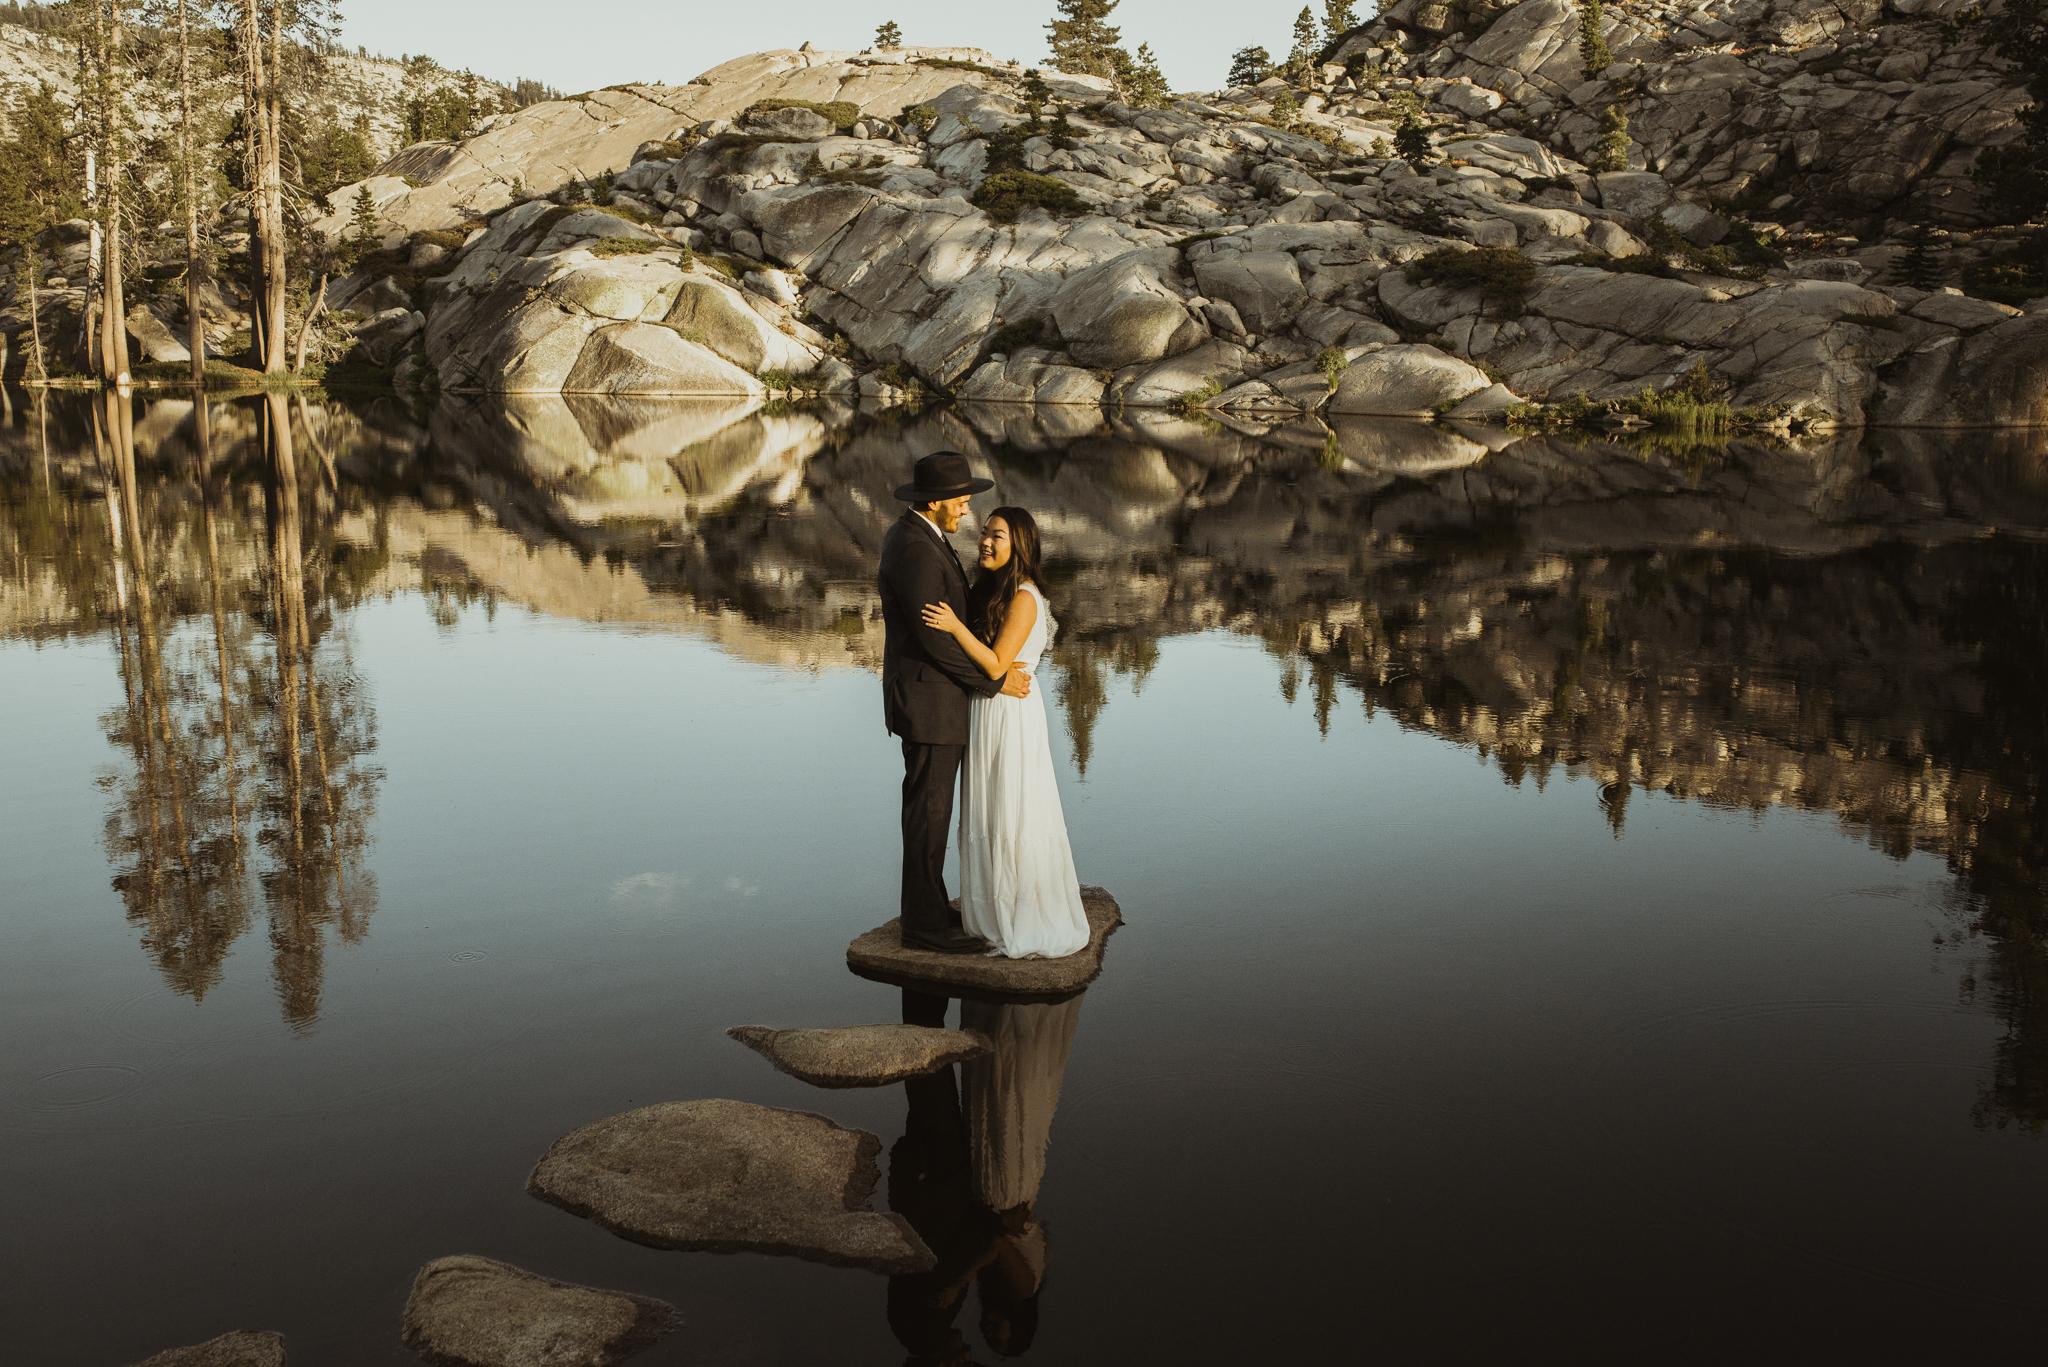 Los Angeles Wedding Photographer - Long Beach Wedding - IsaiahAndTaylor.com